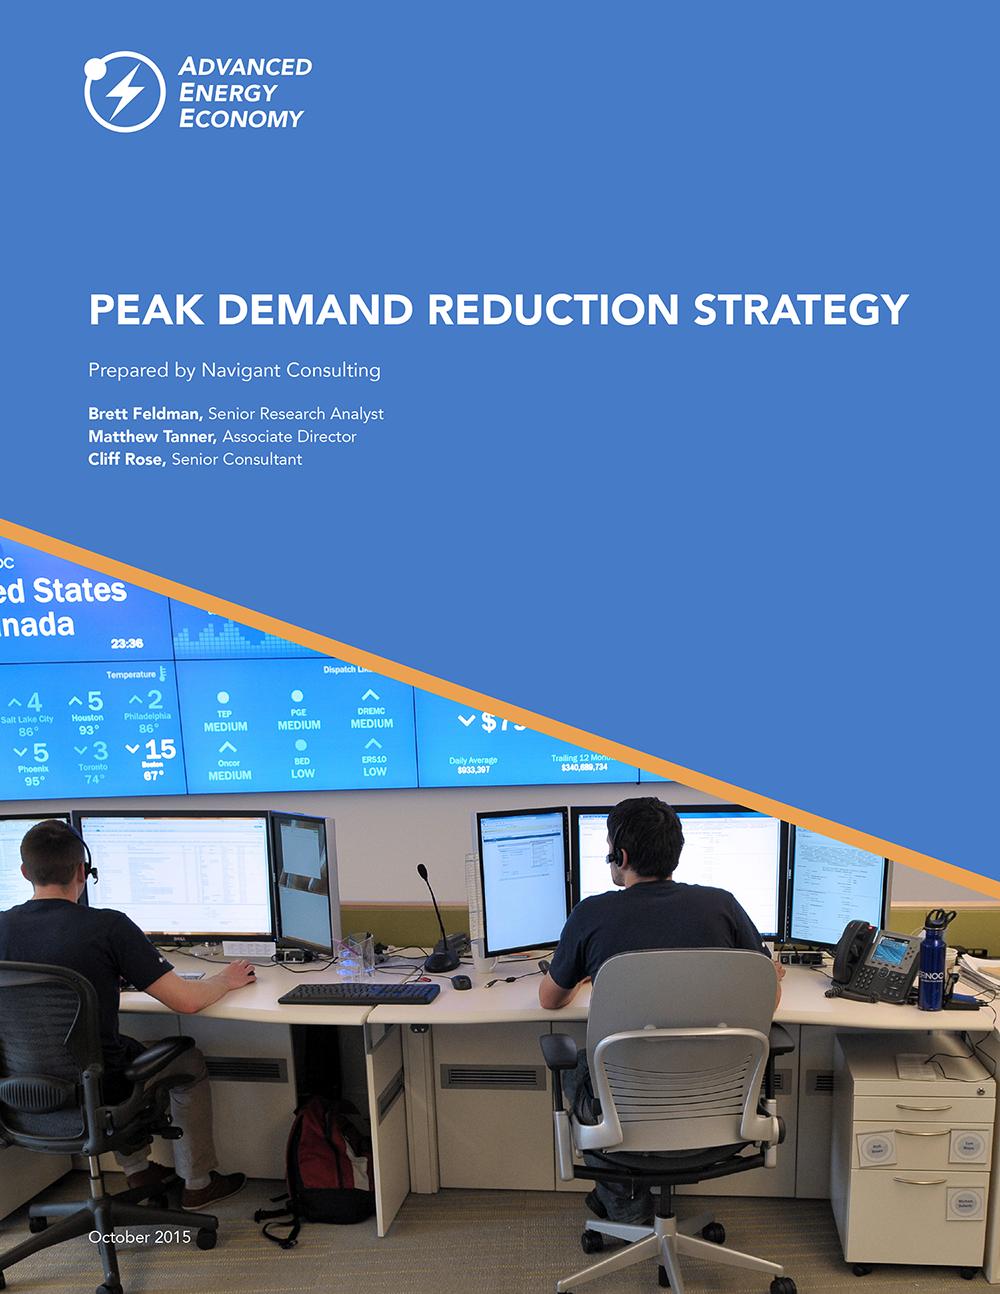 Peak Demand Reduction Strategy